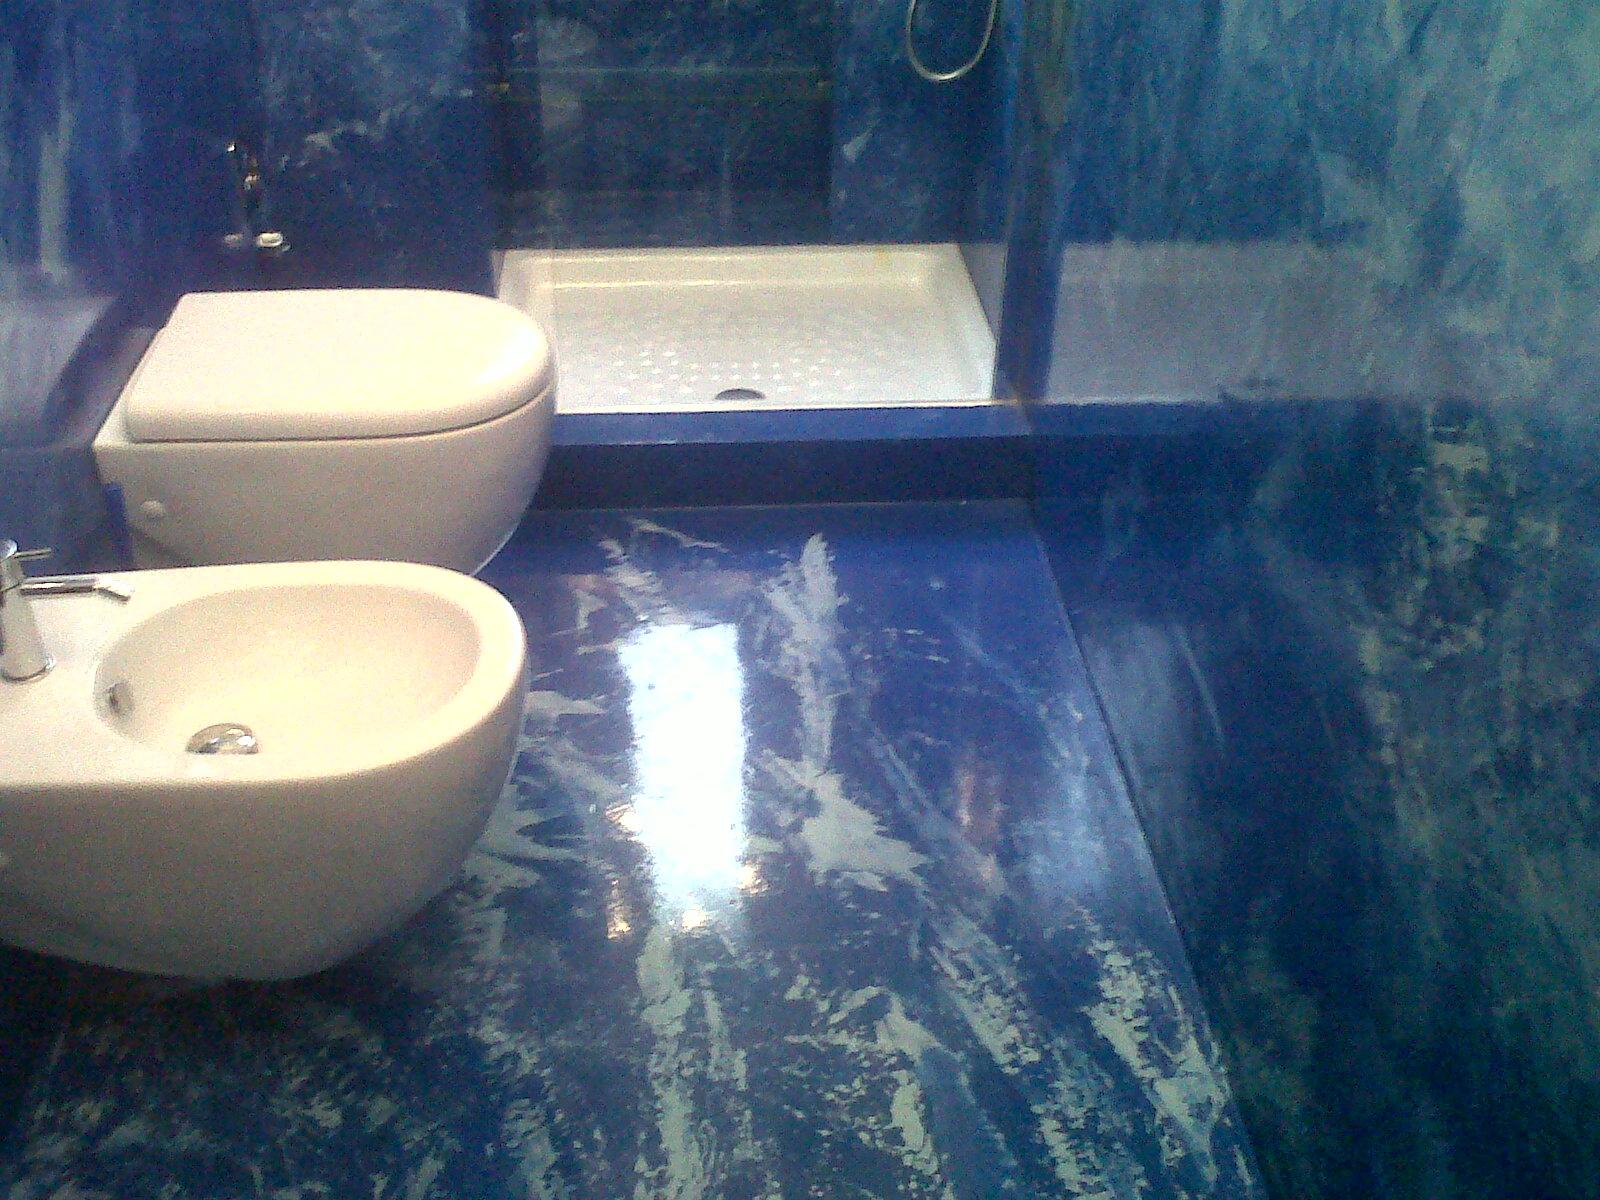 Montier zentrum resina ed effetto spatolato - Pavimenti bagno in resina ...